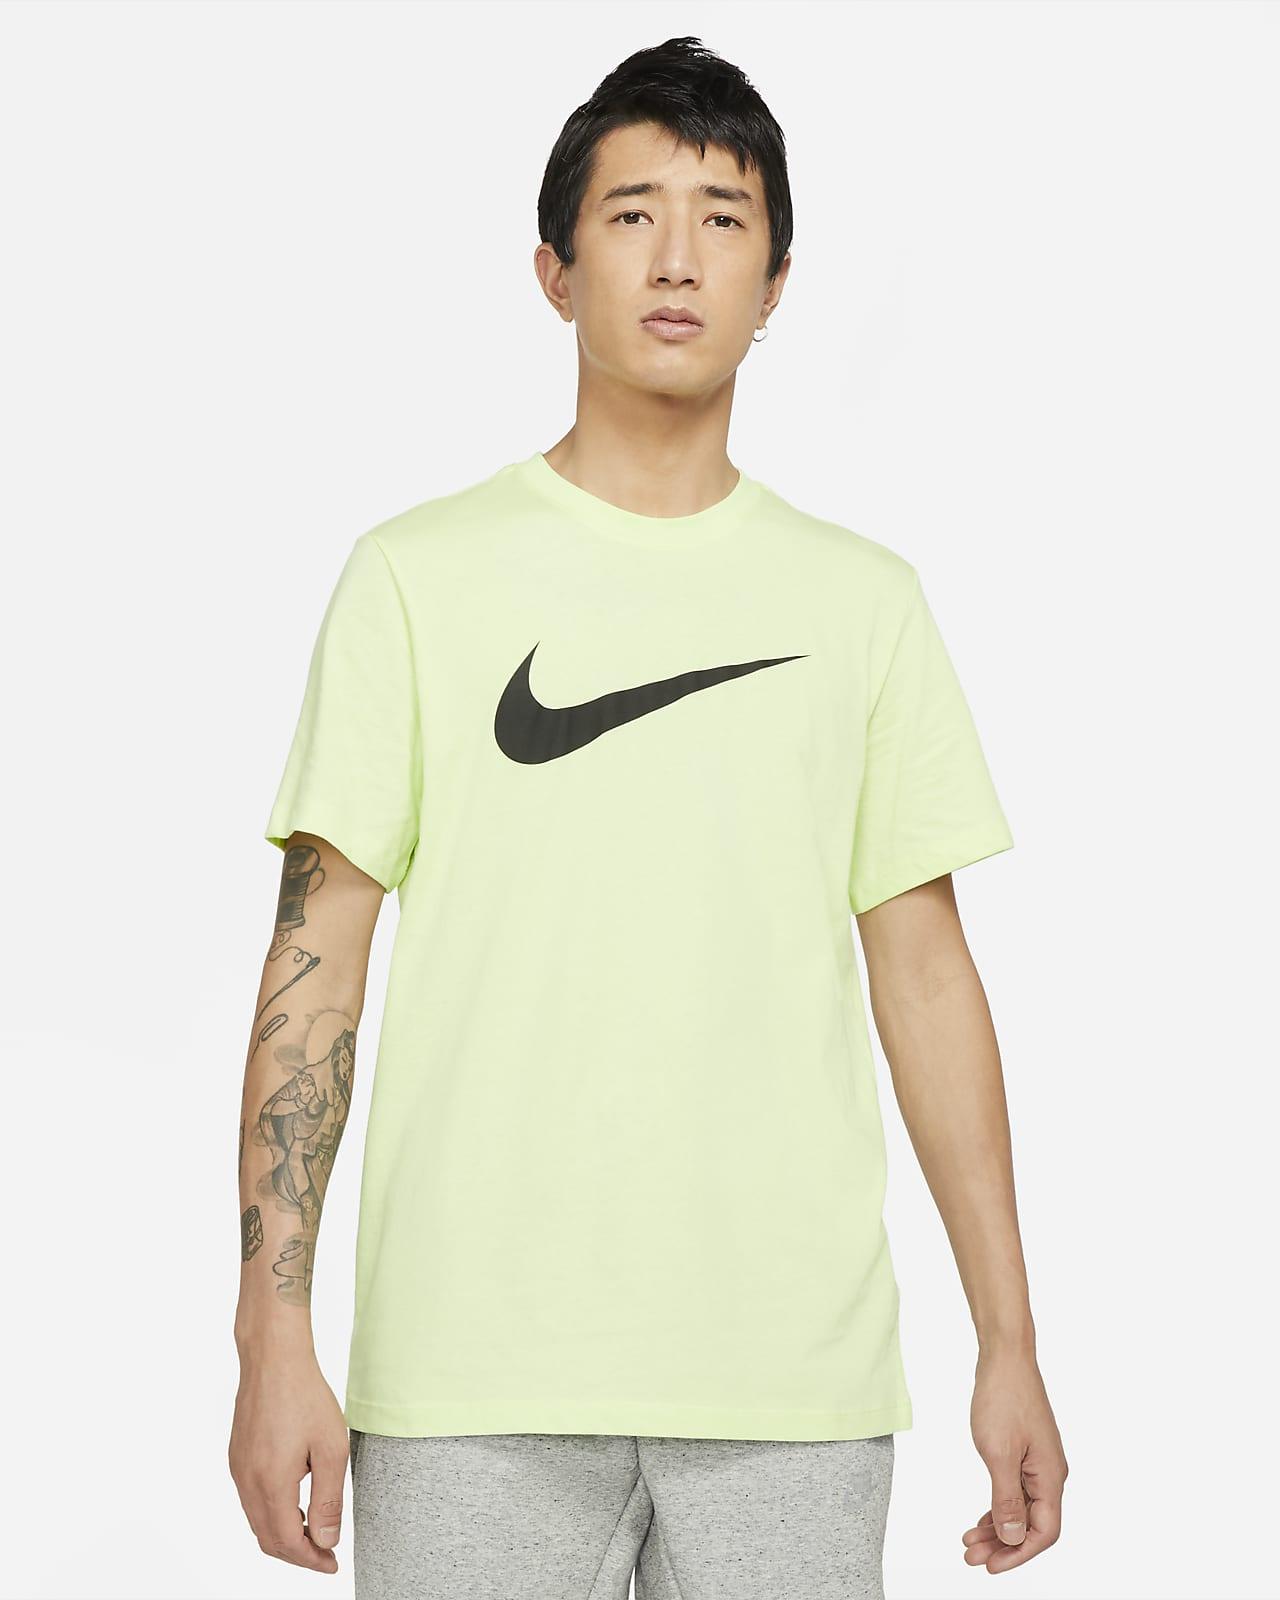 Nike Sportswear Swoosh Herren-T-Shirt